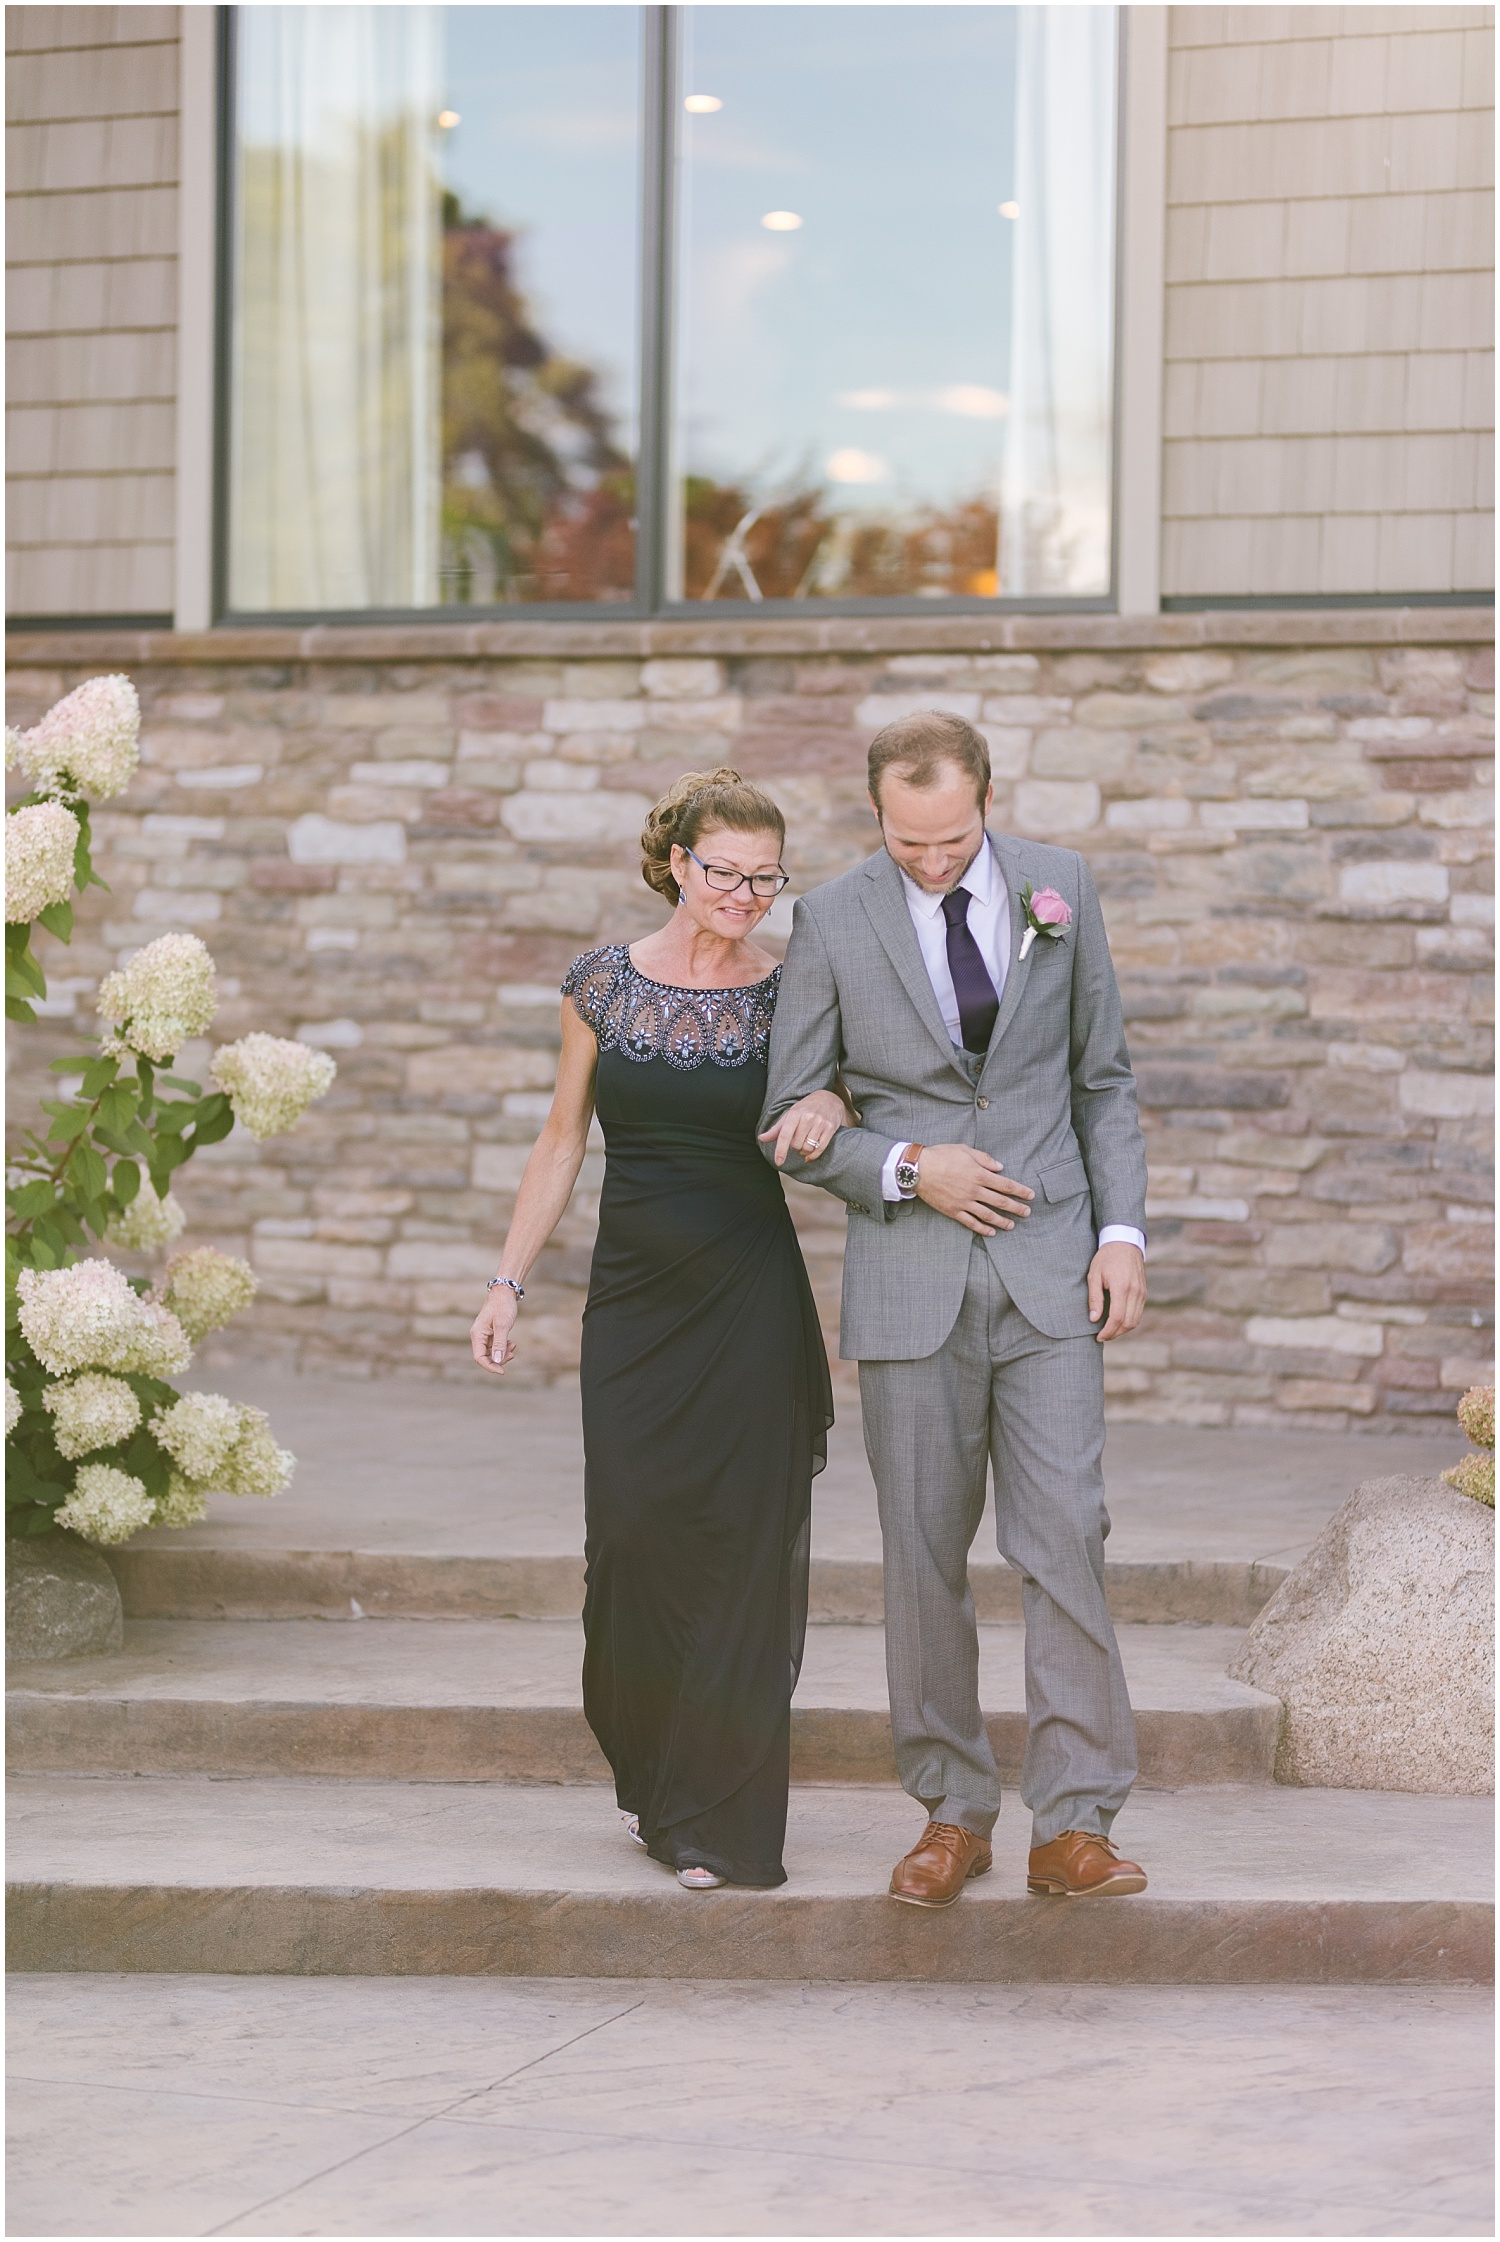 deerfield+country+club+wedding+rochester+NY+photographer (66).jpg